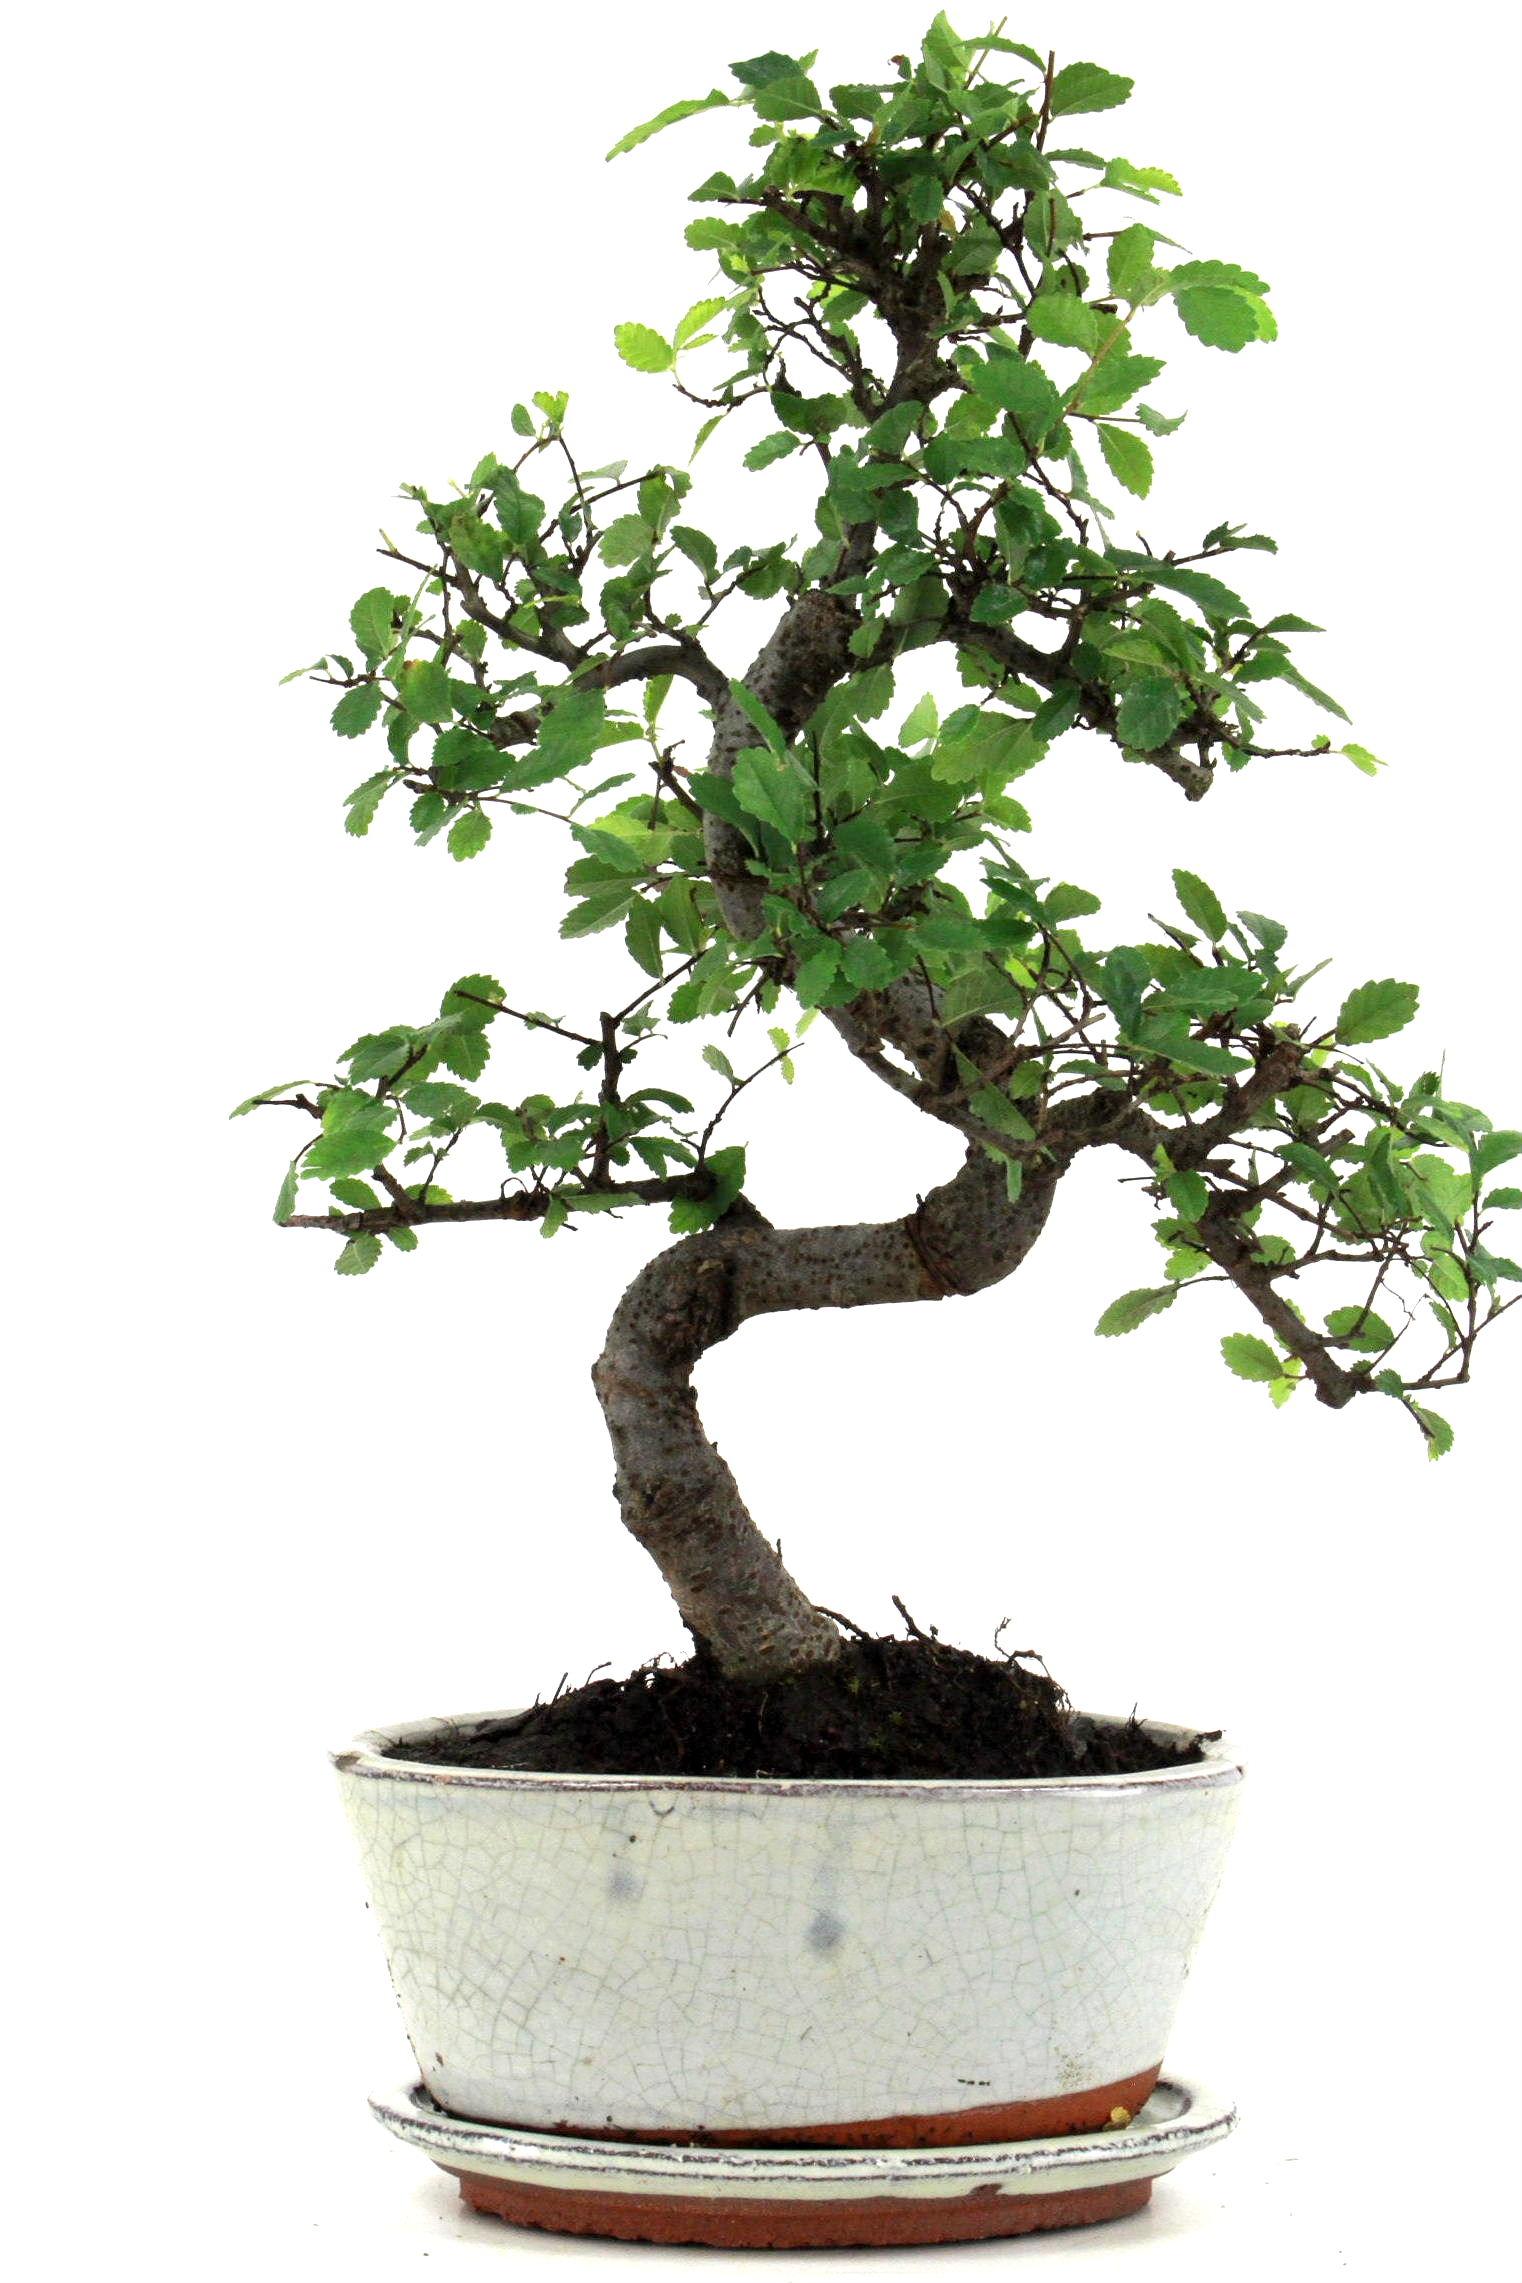 Chinesische ulme bonsai 35 40 cm 1715 bei oyaki bonsai kaufen for Bonsai onlineshop